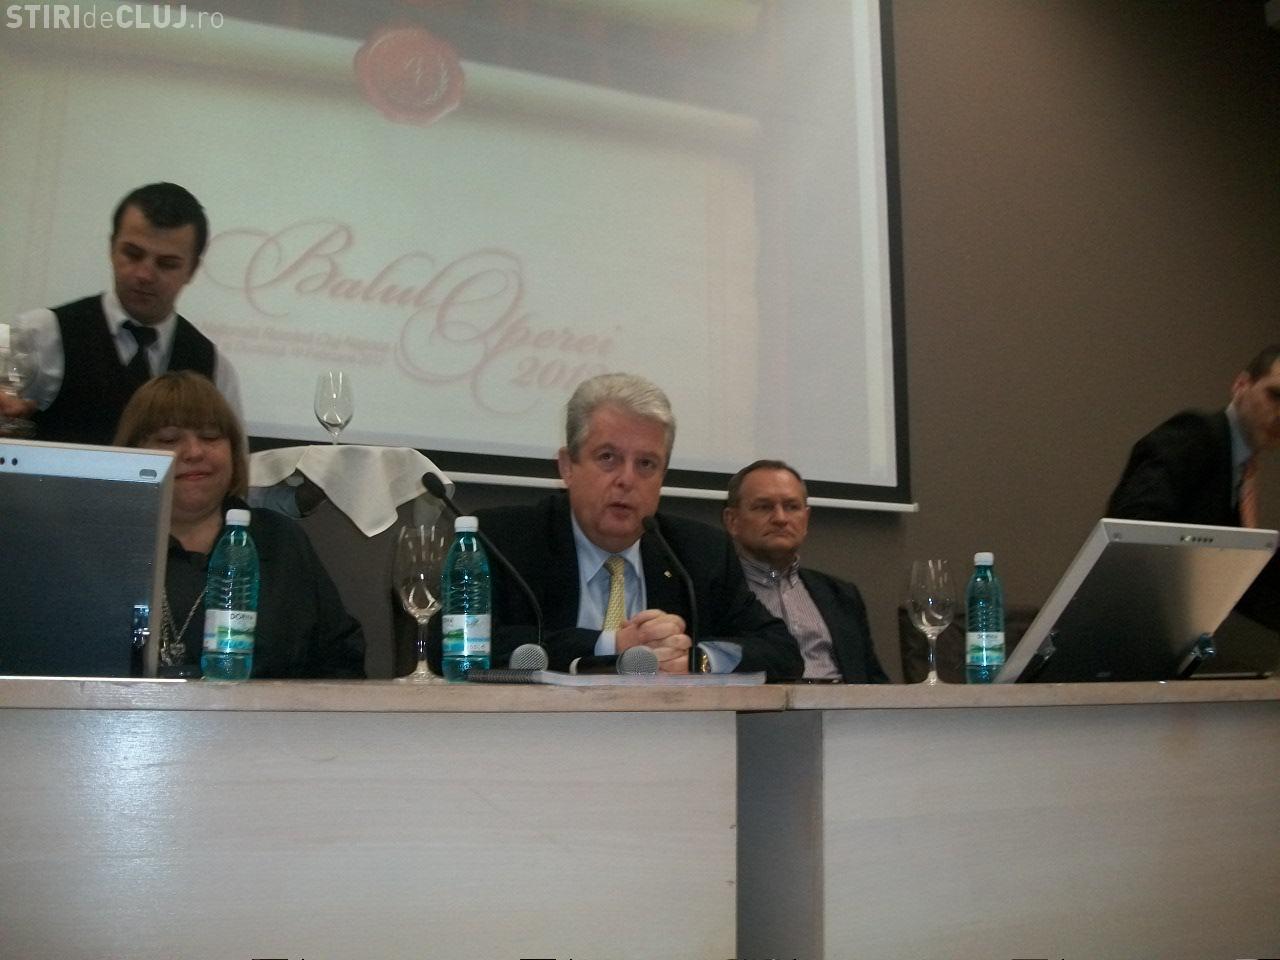 Balul Operei 2012 la Cluj, in stil vienez! Evenimentul va avea loc in 18 - 19 februarie